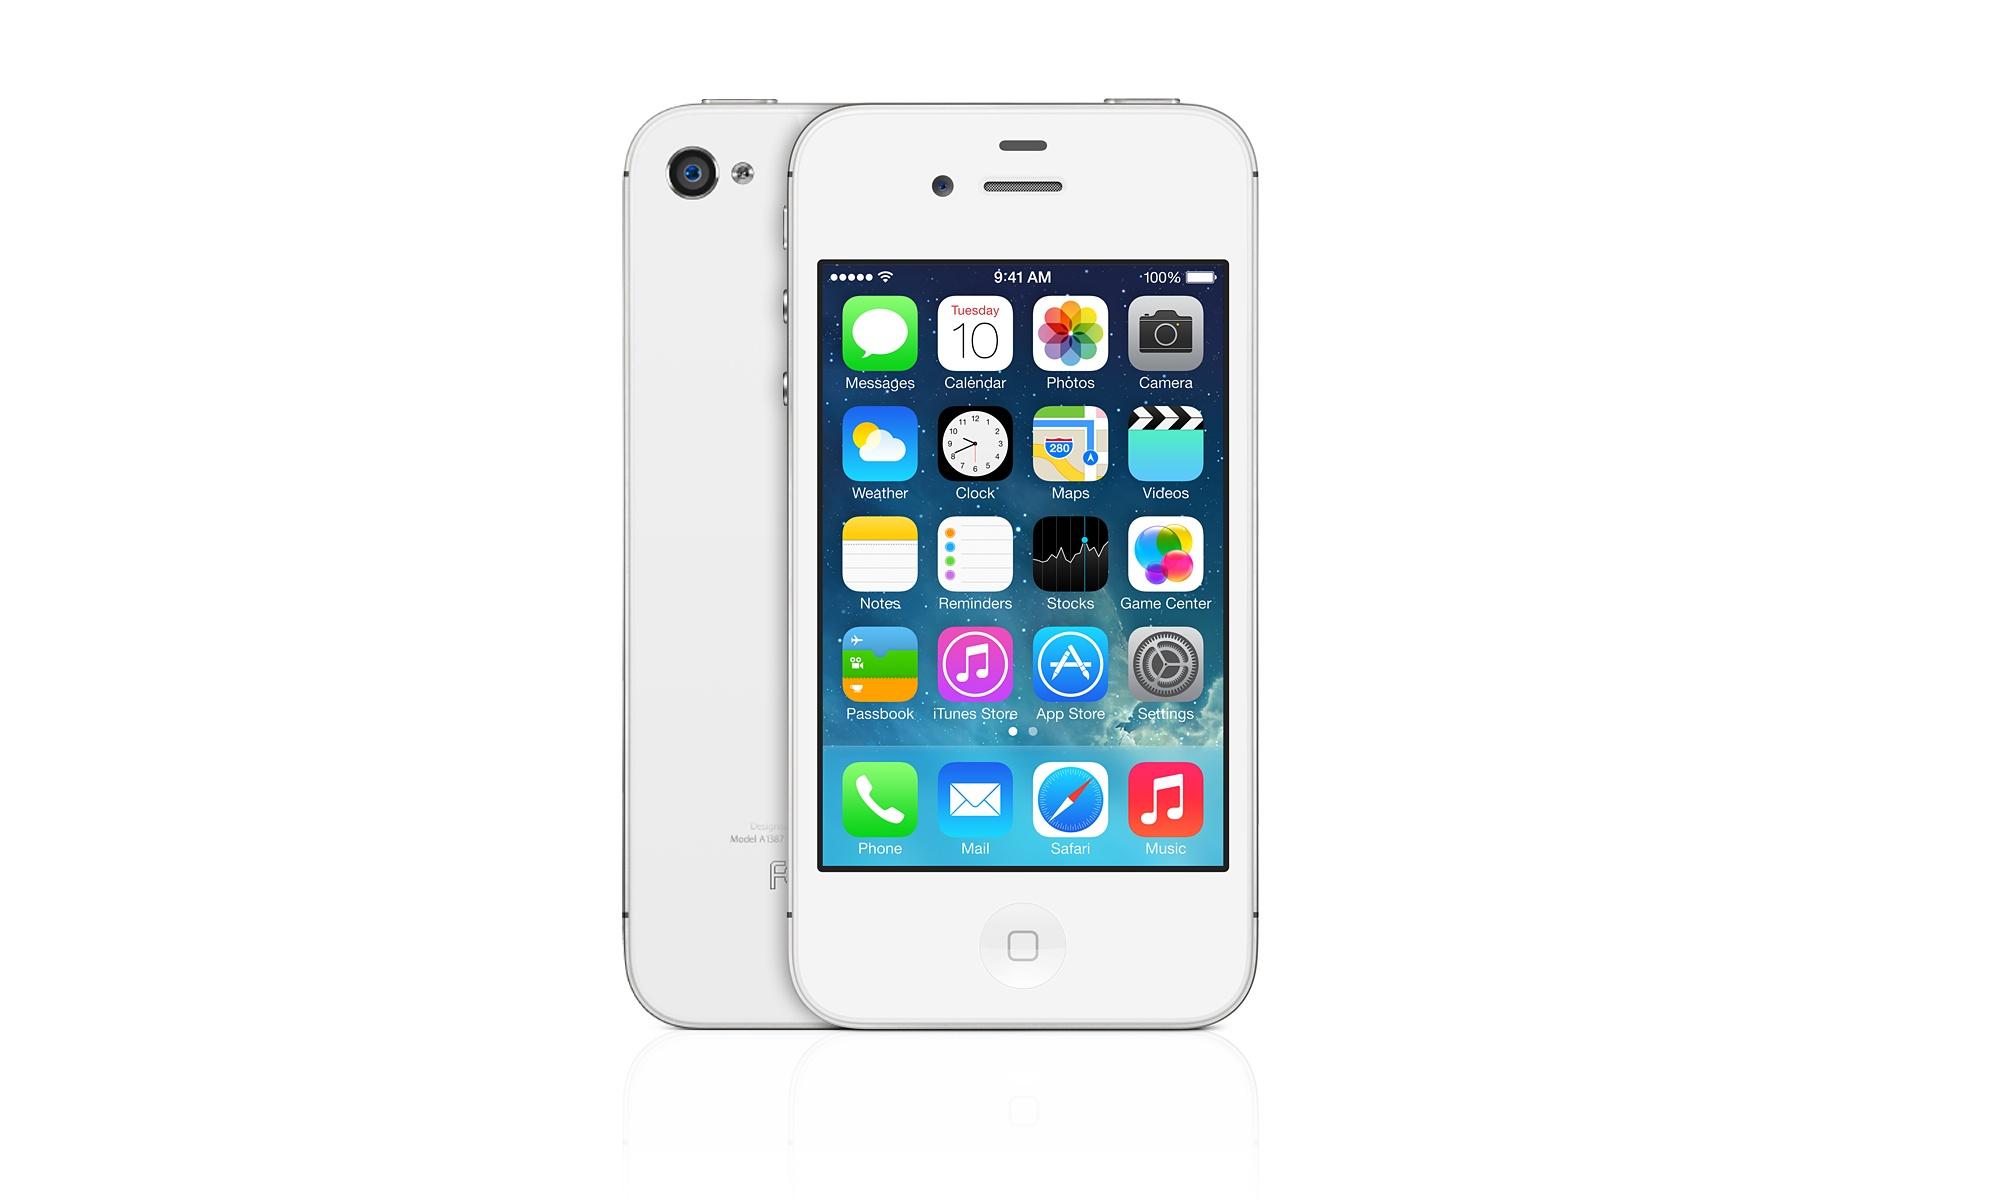 h iphone 4s truemove h ลดราคา iphone 4s ลงอ ก 6 000 บาทเหล อเพ ยง 8 900 บาทเท าน น specphone